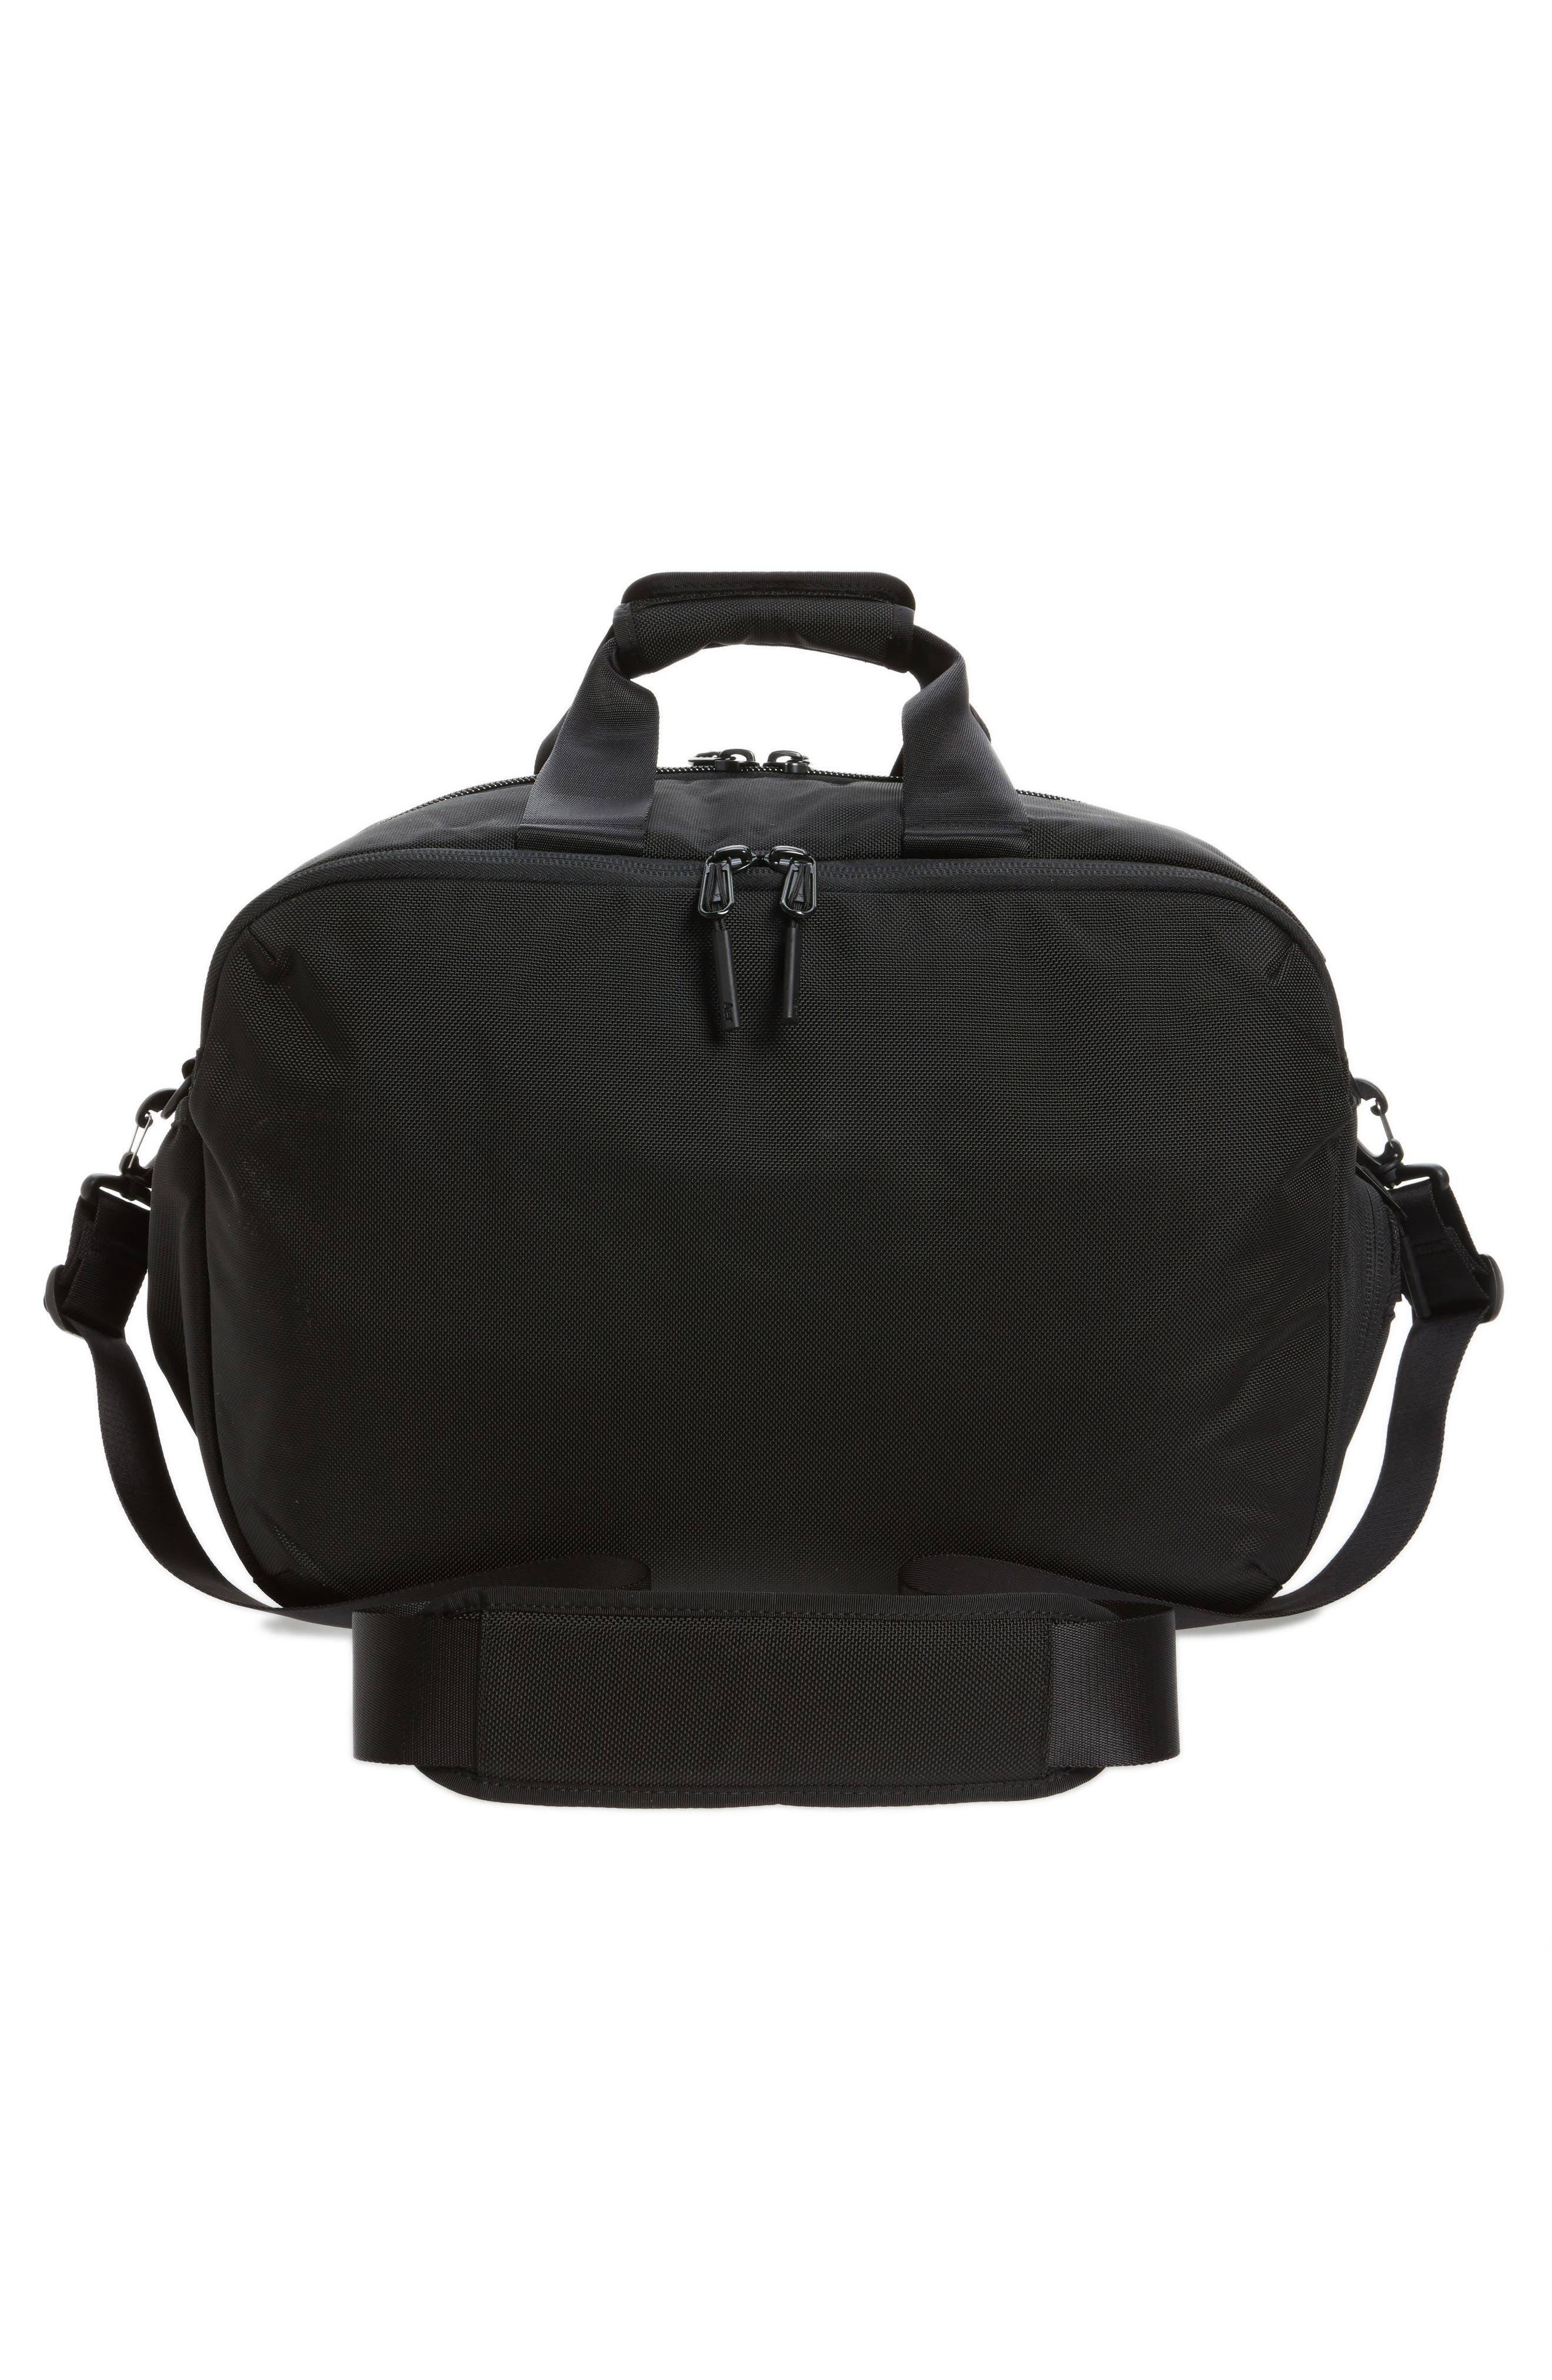 Gym Duffel 2 Bag,                             Alternate thumbnail 3, color,                             Black